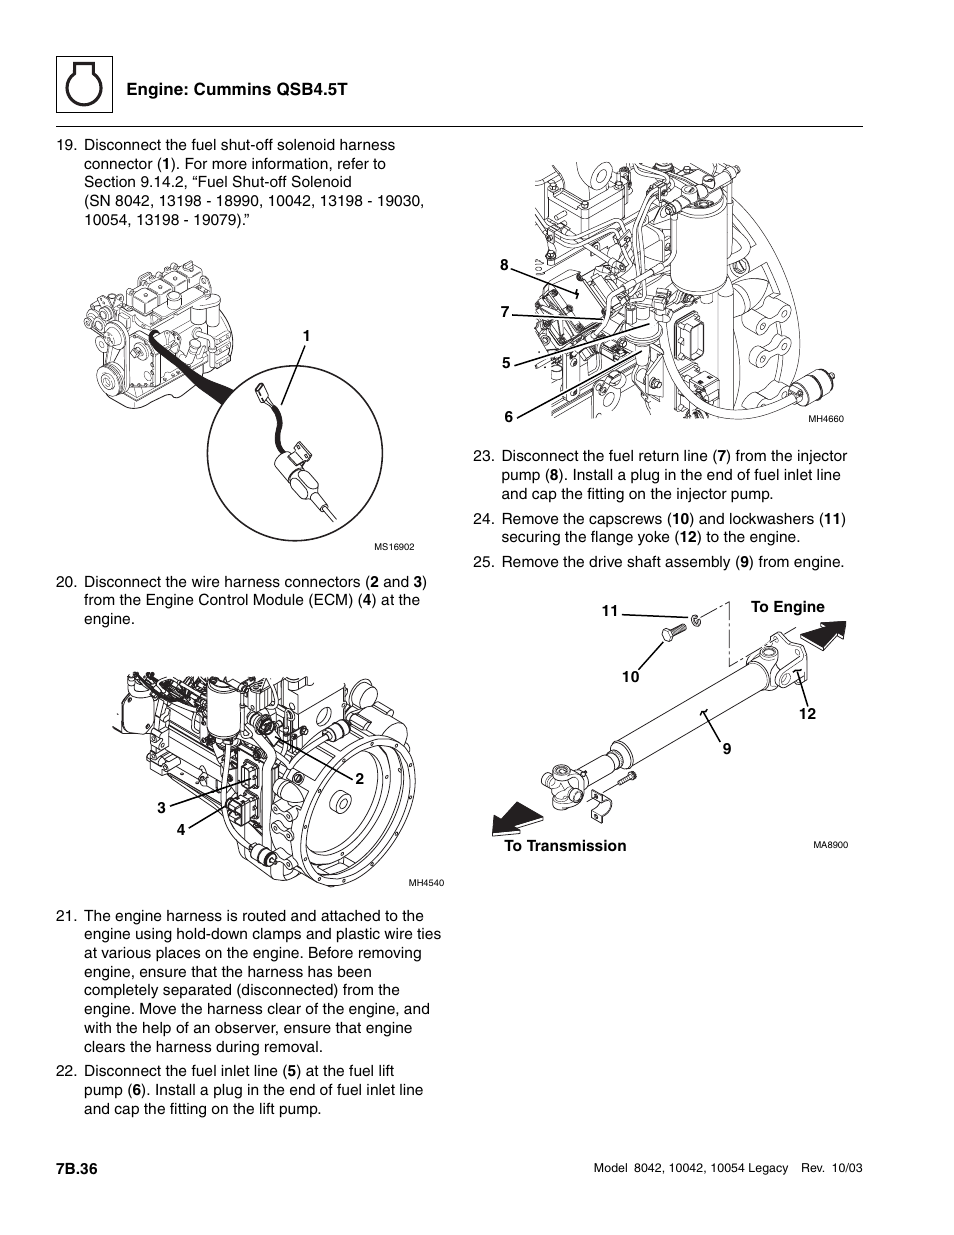 WRG-7916] Cummins Fuel Shut Off Solenoid Wiring Diagram